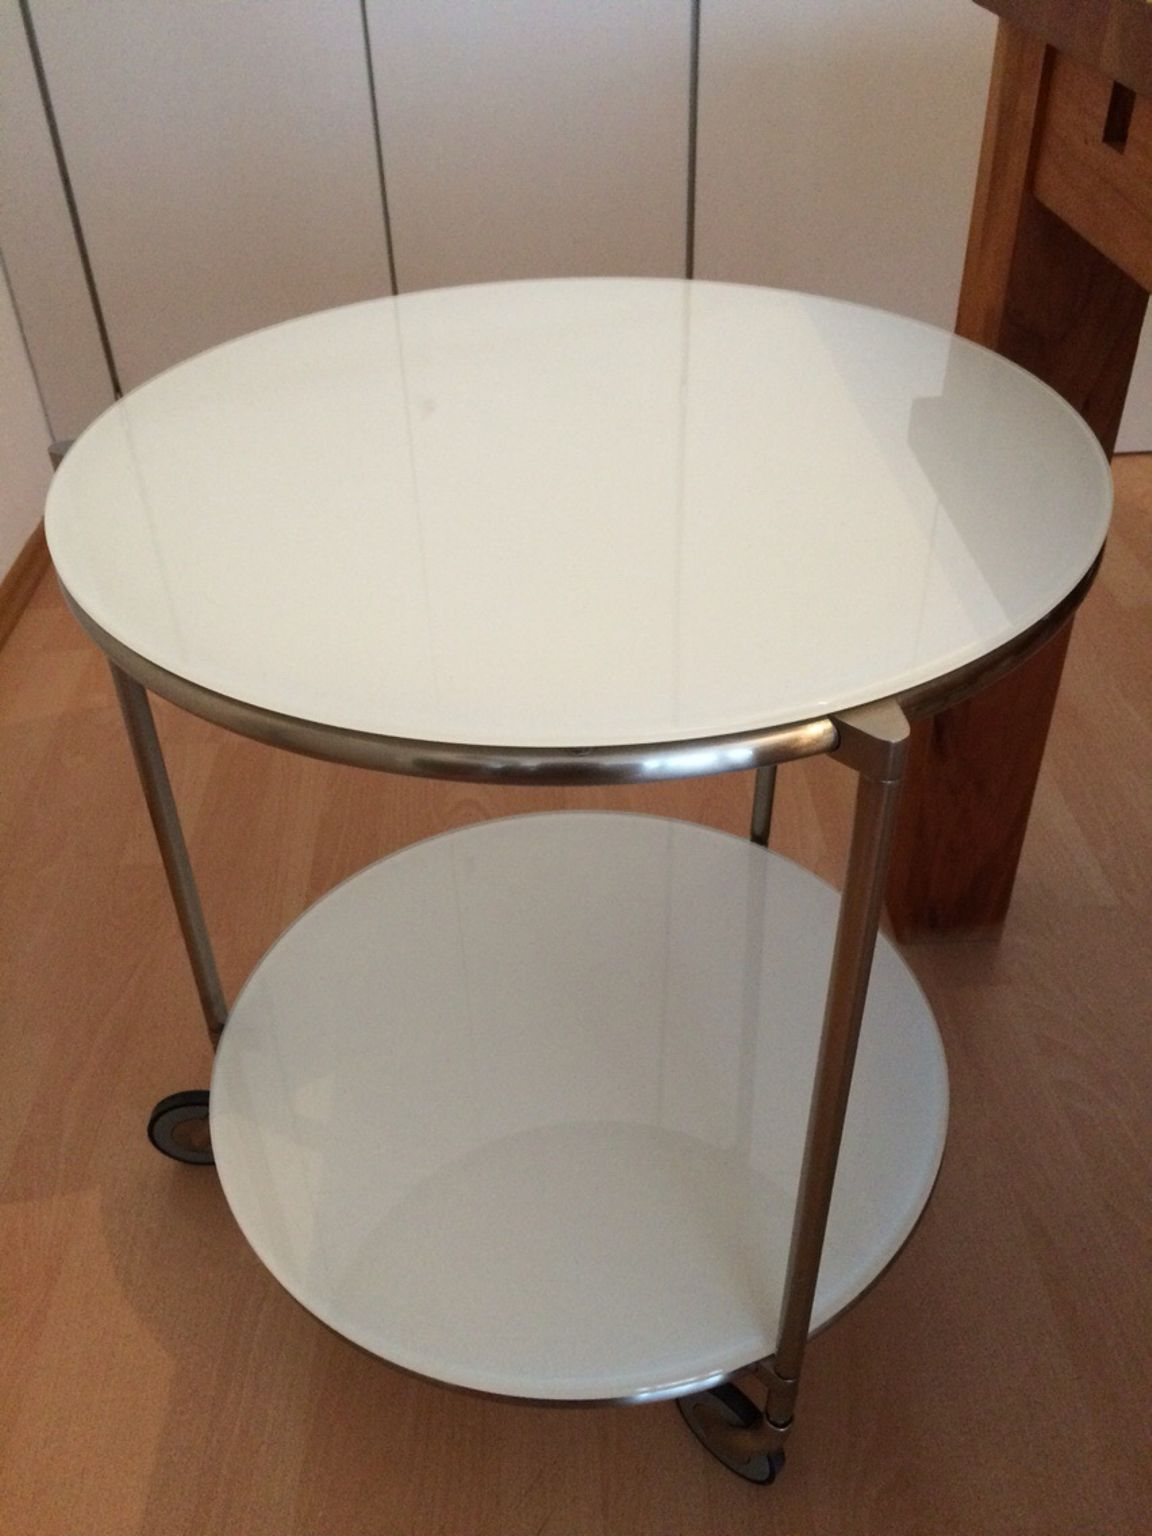 72 Lebhaft Ikea Kuche Tisch Dengan Gambar